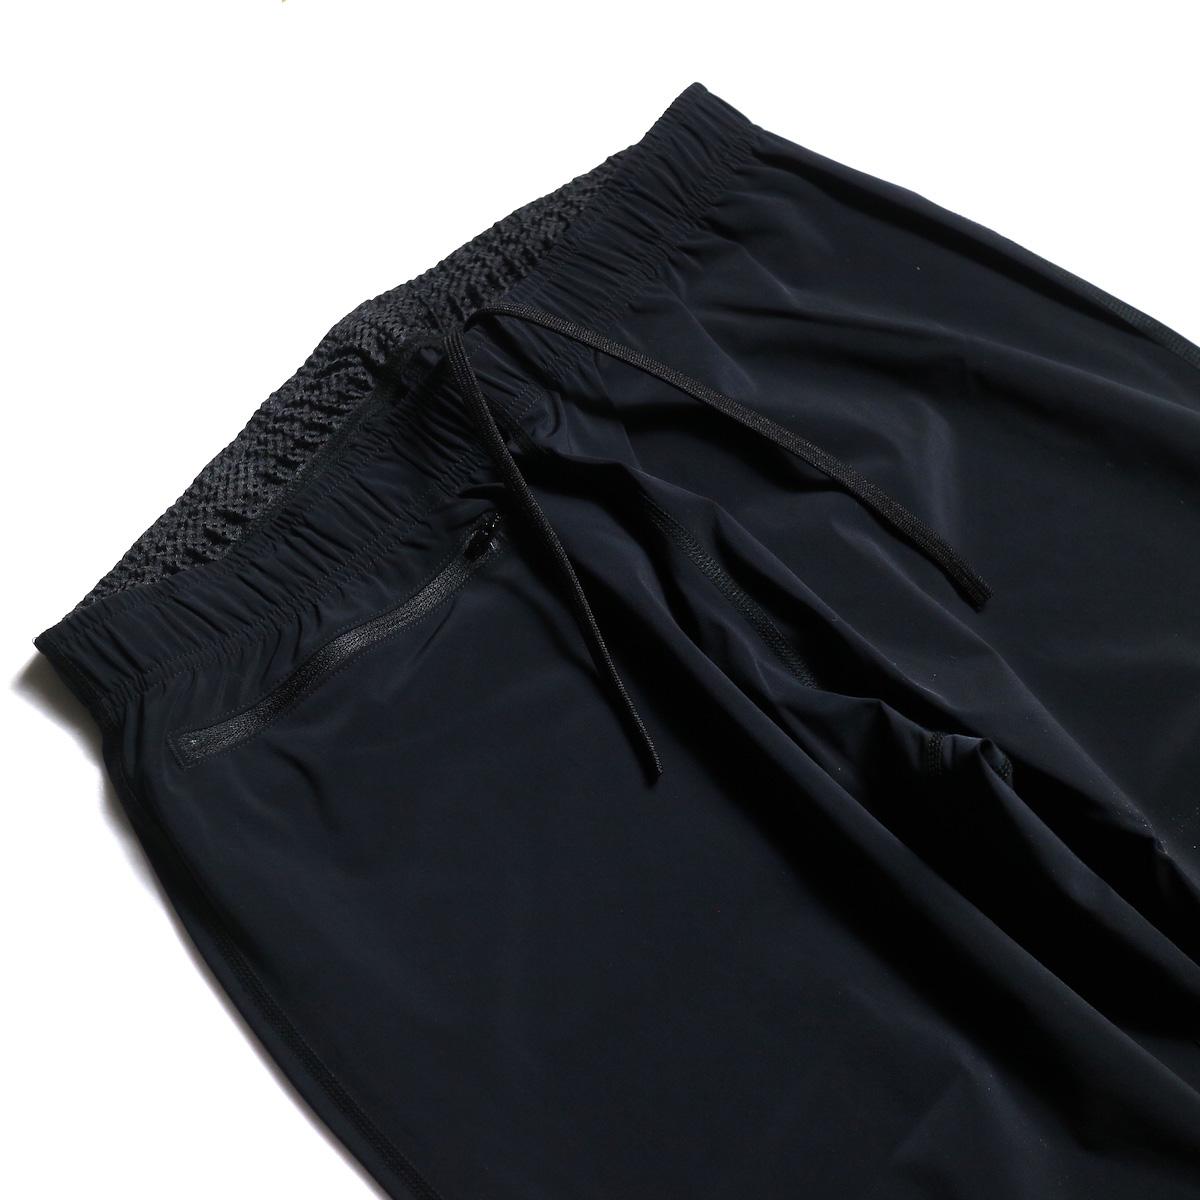 SOUTH2 WEST8 / 1P Cycle Pant-N/Pu Taffeta (Black) ウエスト